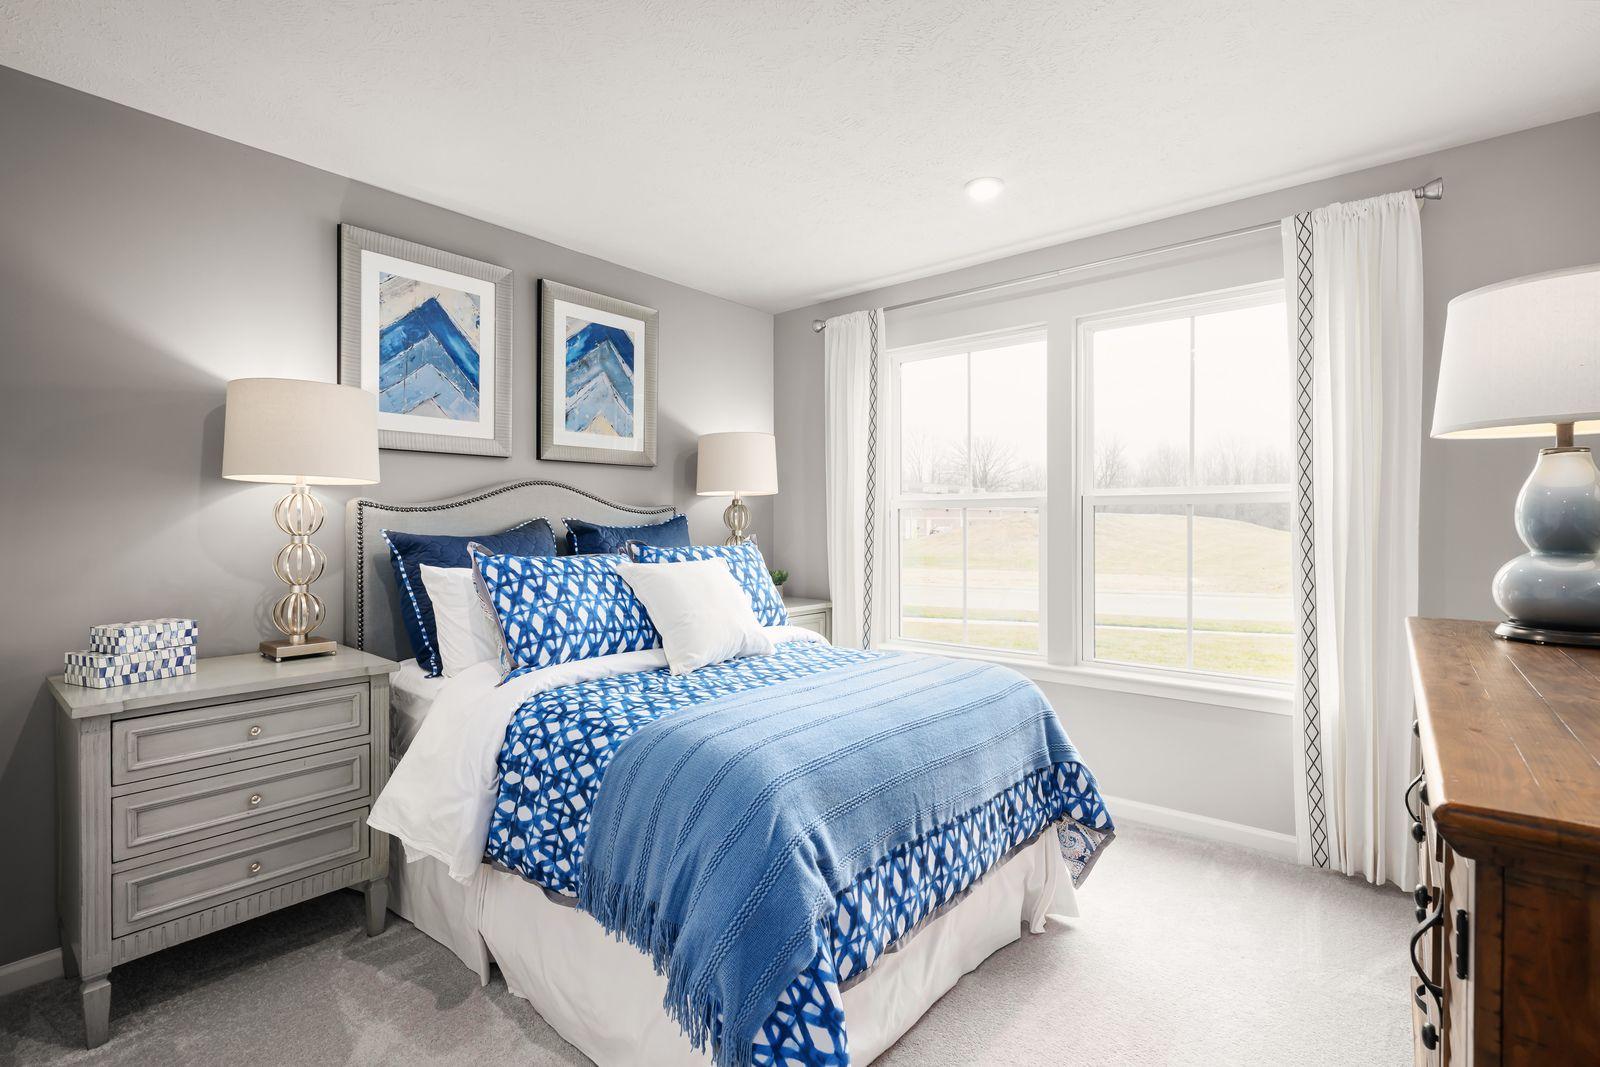 Bedroom featured in the Aviano By Ryan Homes in Sussex, DE